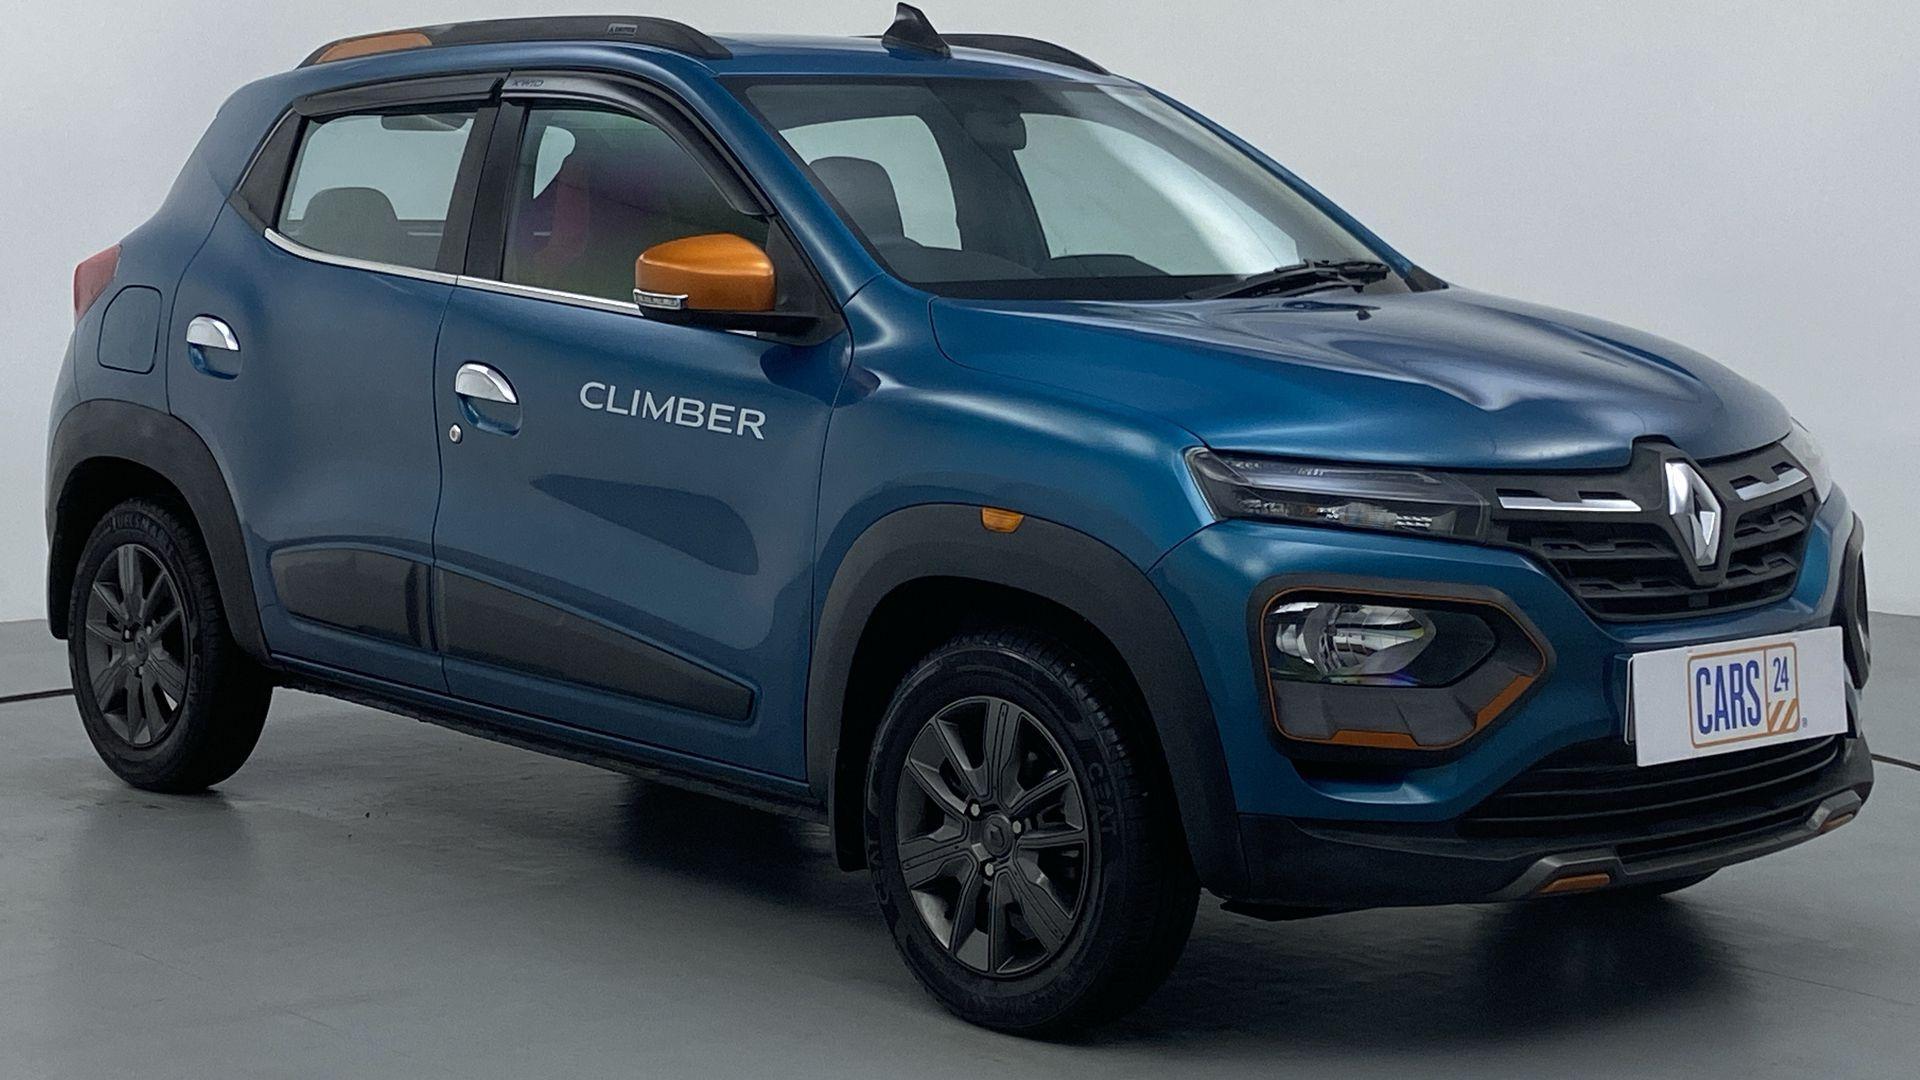 2019 Renault Kwid 1.0 CLIMBER OPT AMT